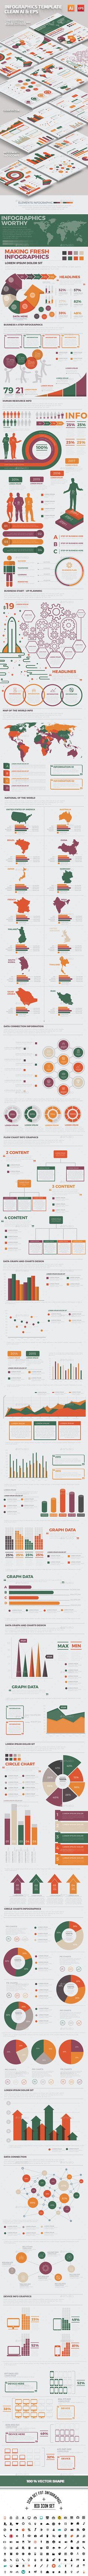 Big Infographics Template Design — Vector EPS #corporate #pie • Download ➝ https://graphicriver.net/item/big-infographics-template-design/19632700?ref=pxcr